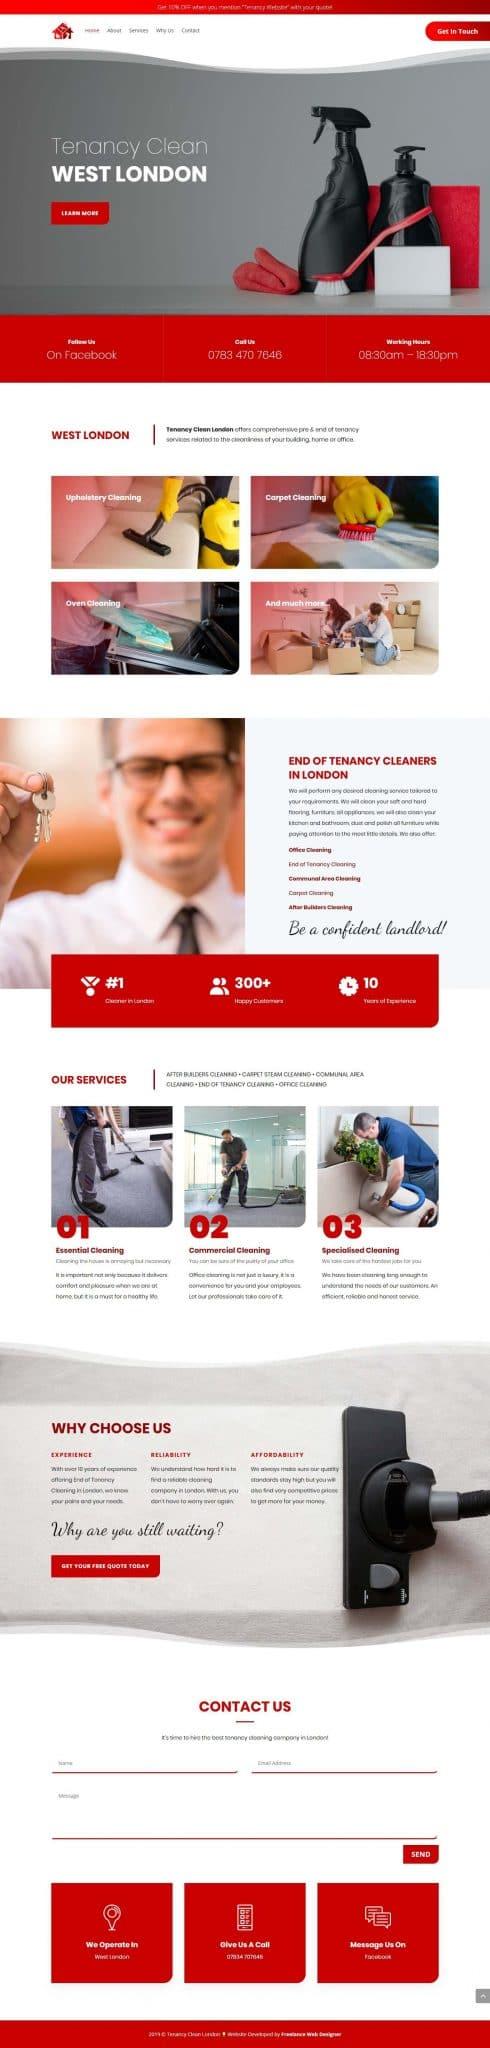 Website Design Manchester